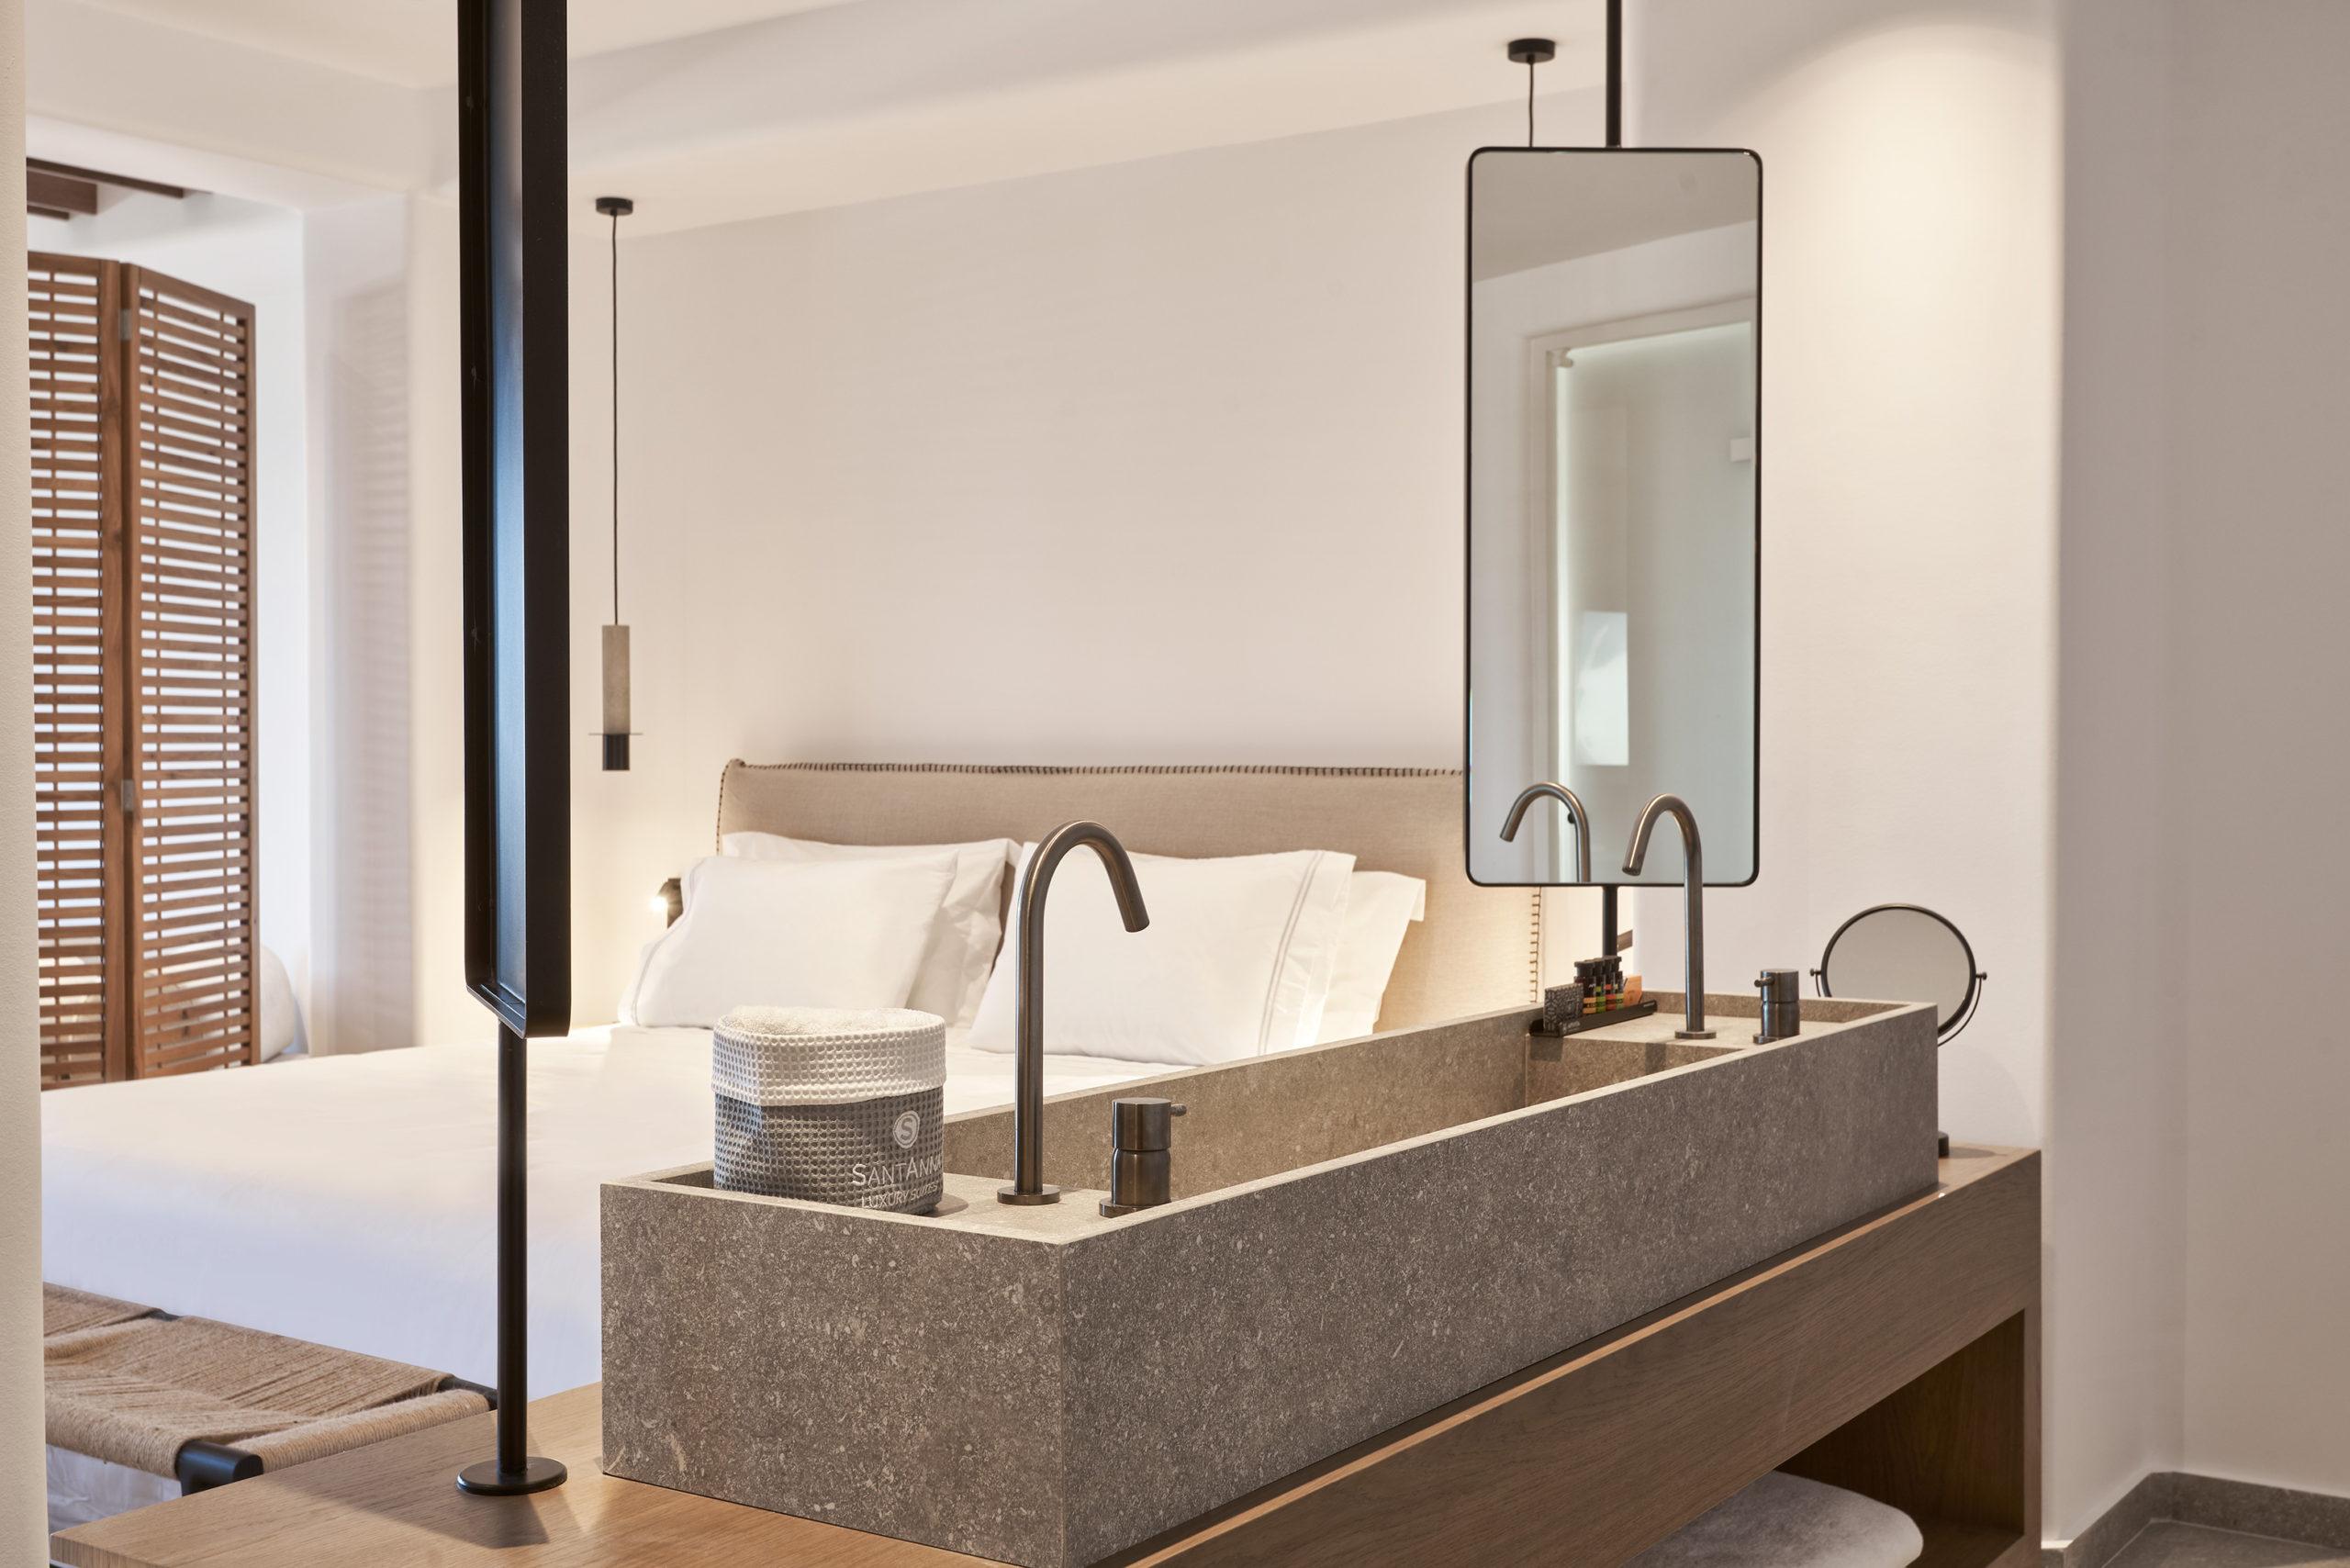 SantAnna Luxury Suites - Deluxe Suites Pool Front